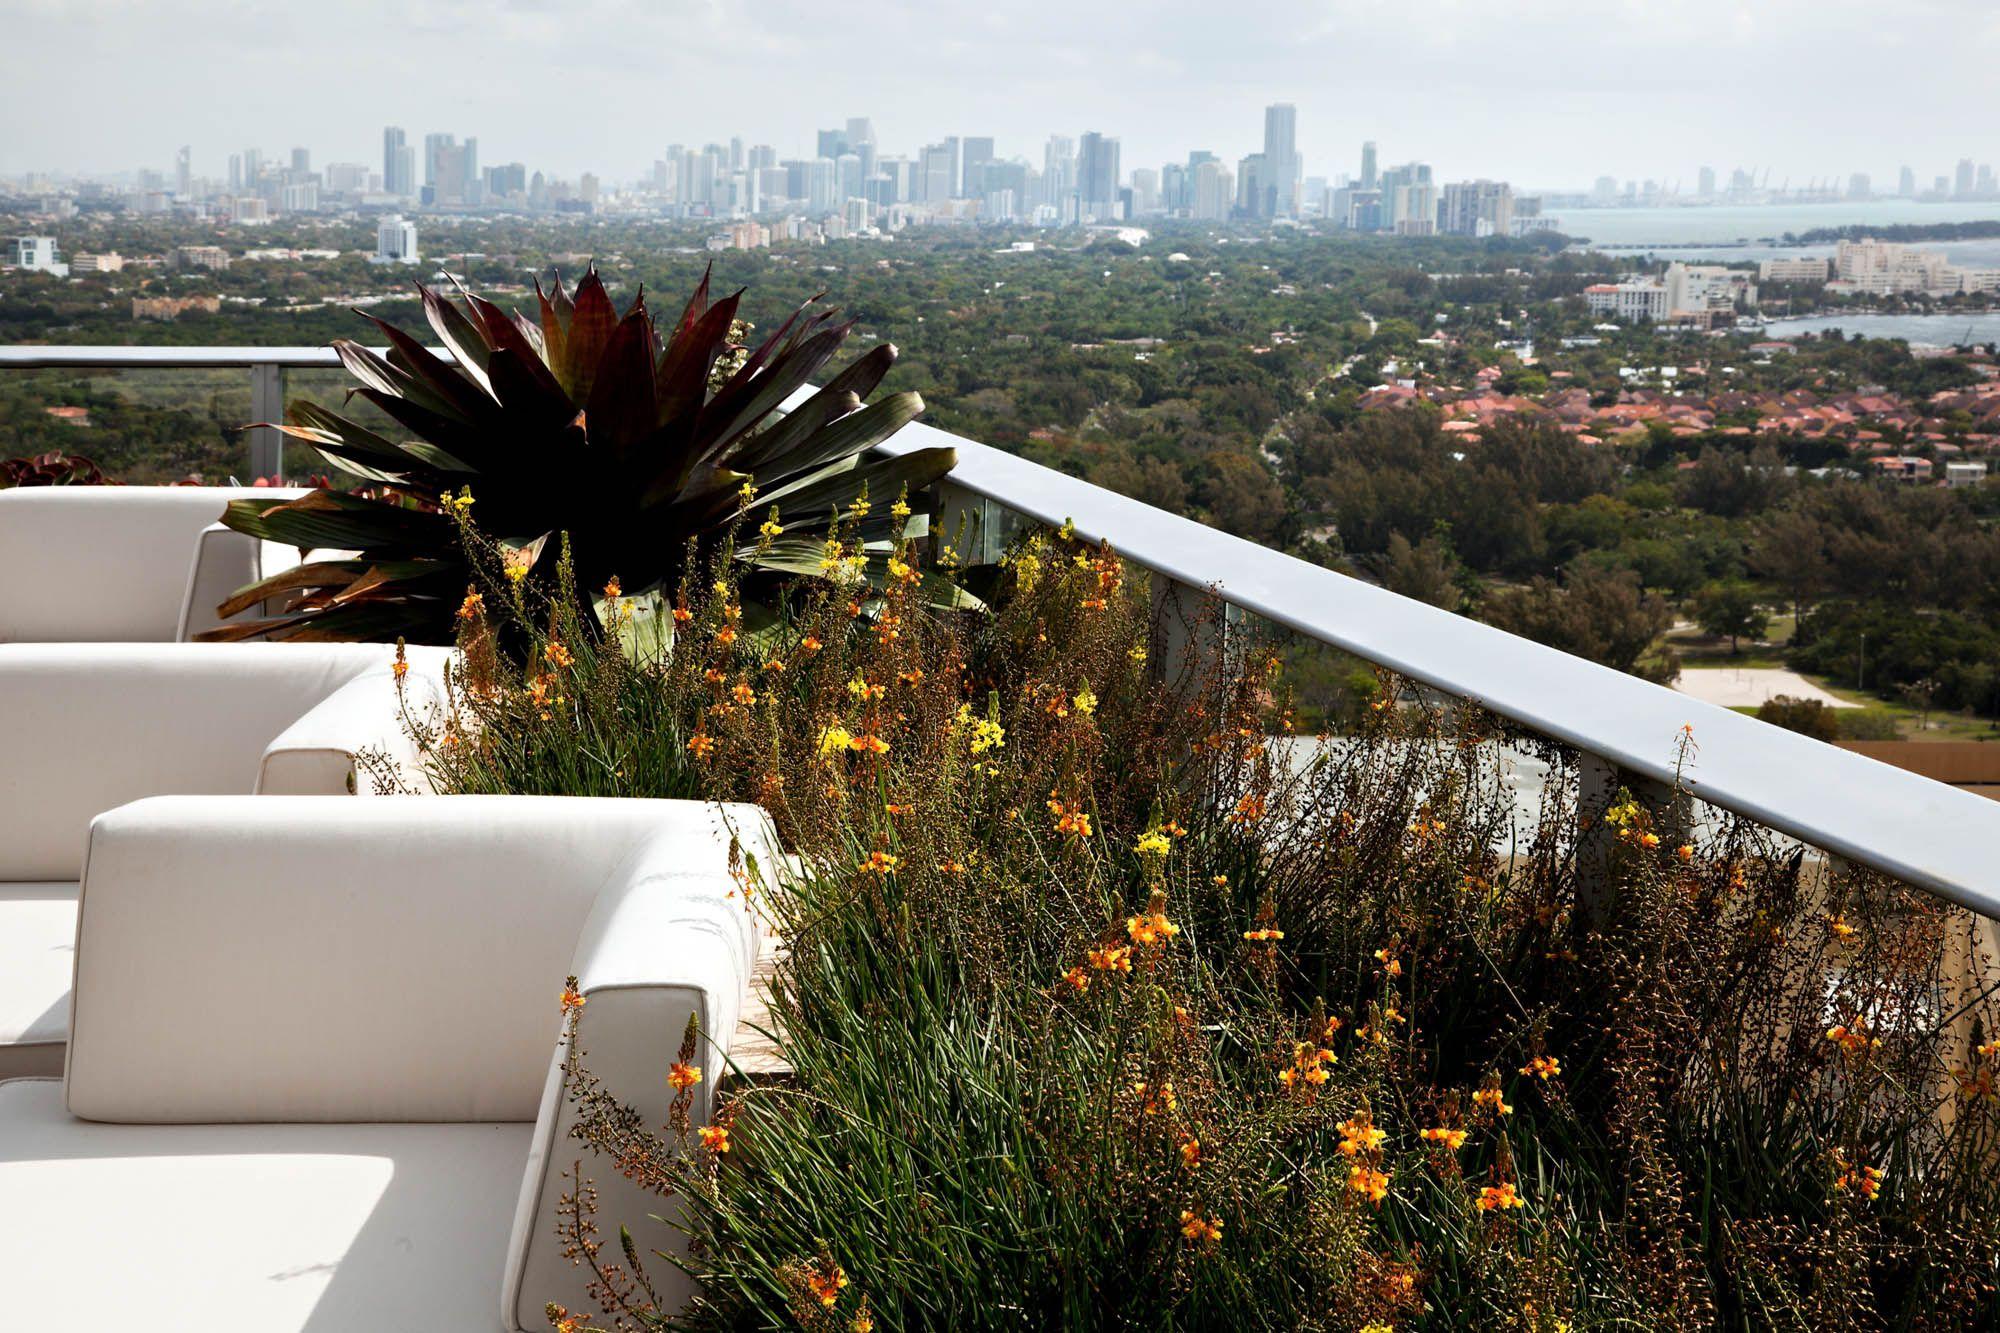 06-Steven Brooke Photography-Grovenor Rooftop Garden | Landscape ...